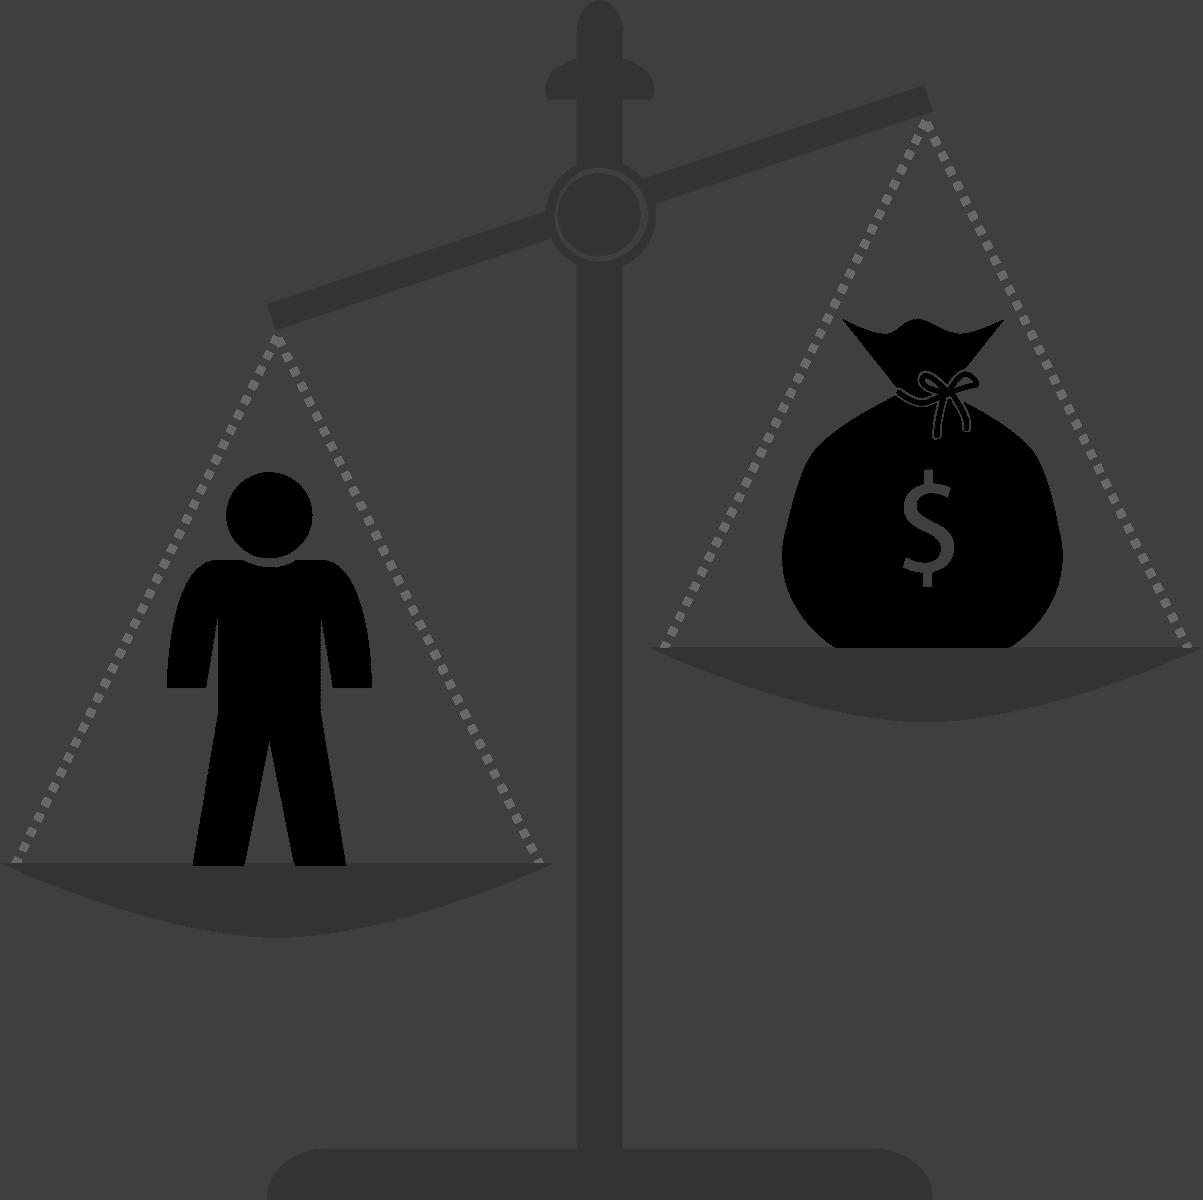 הלבנת הון – עונש